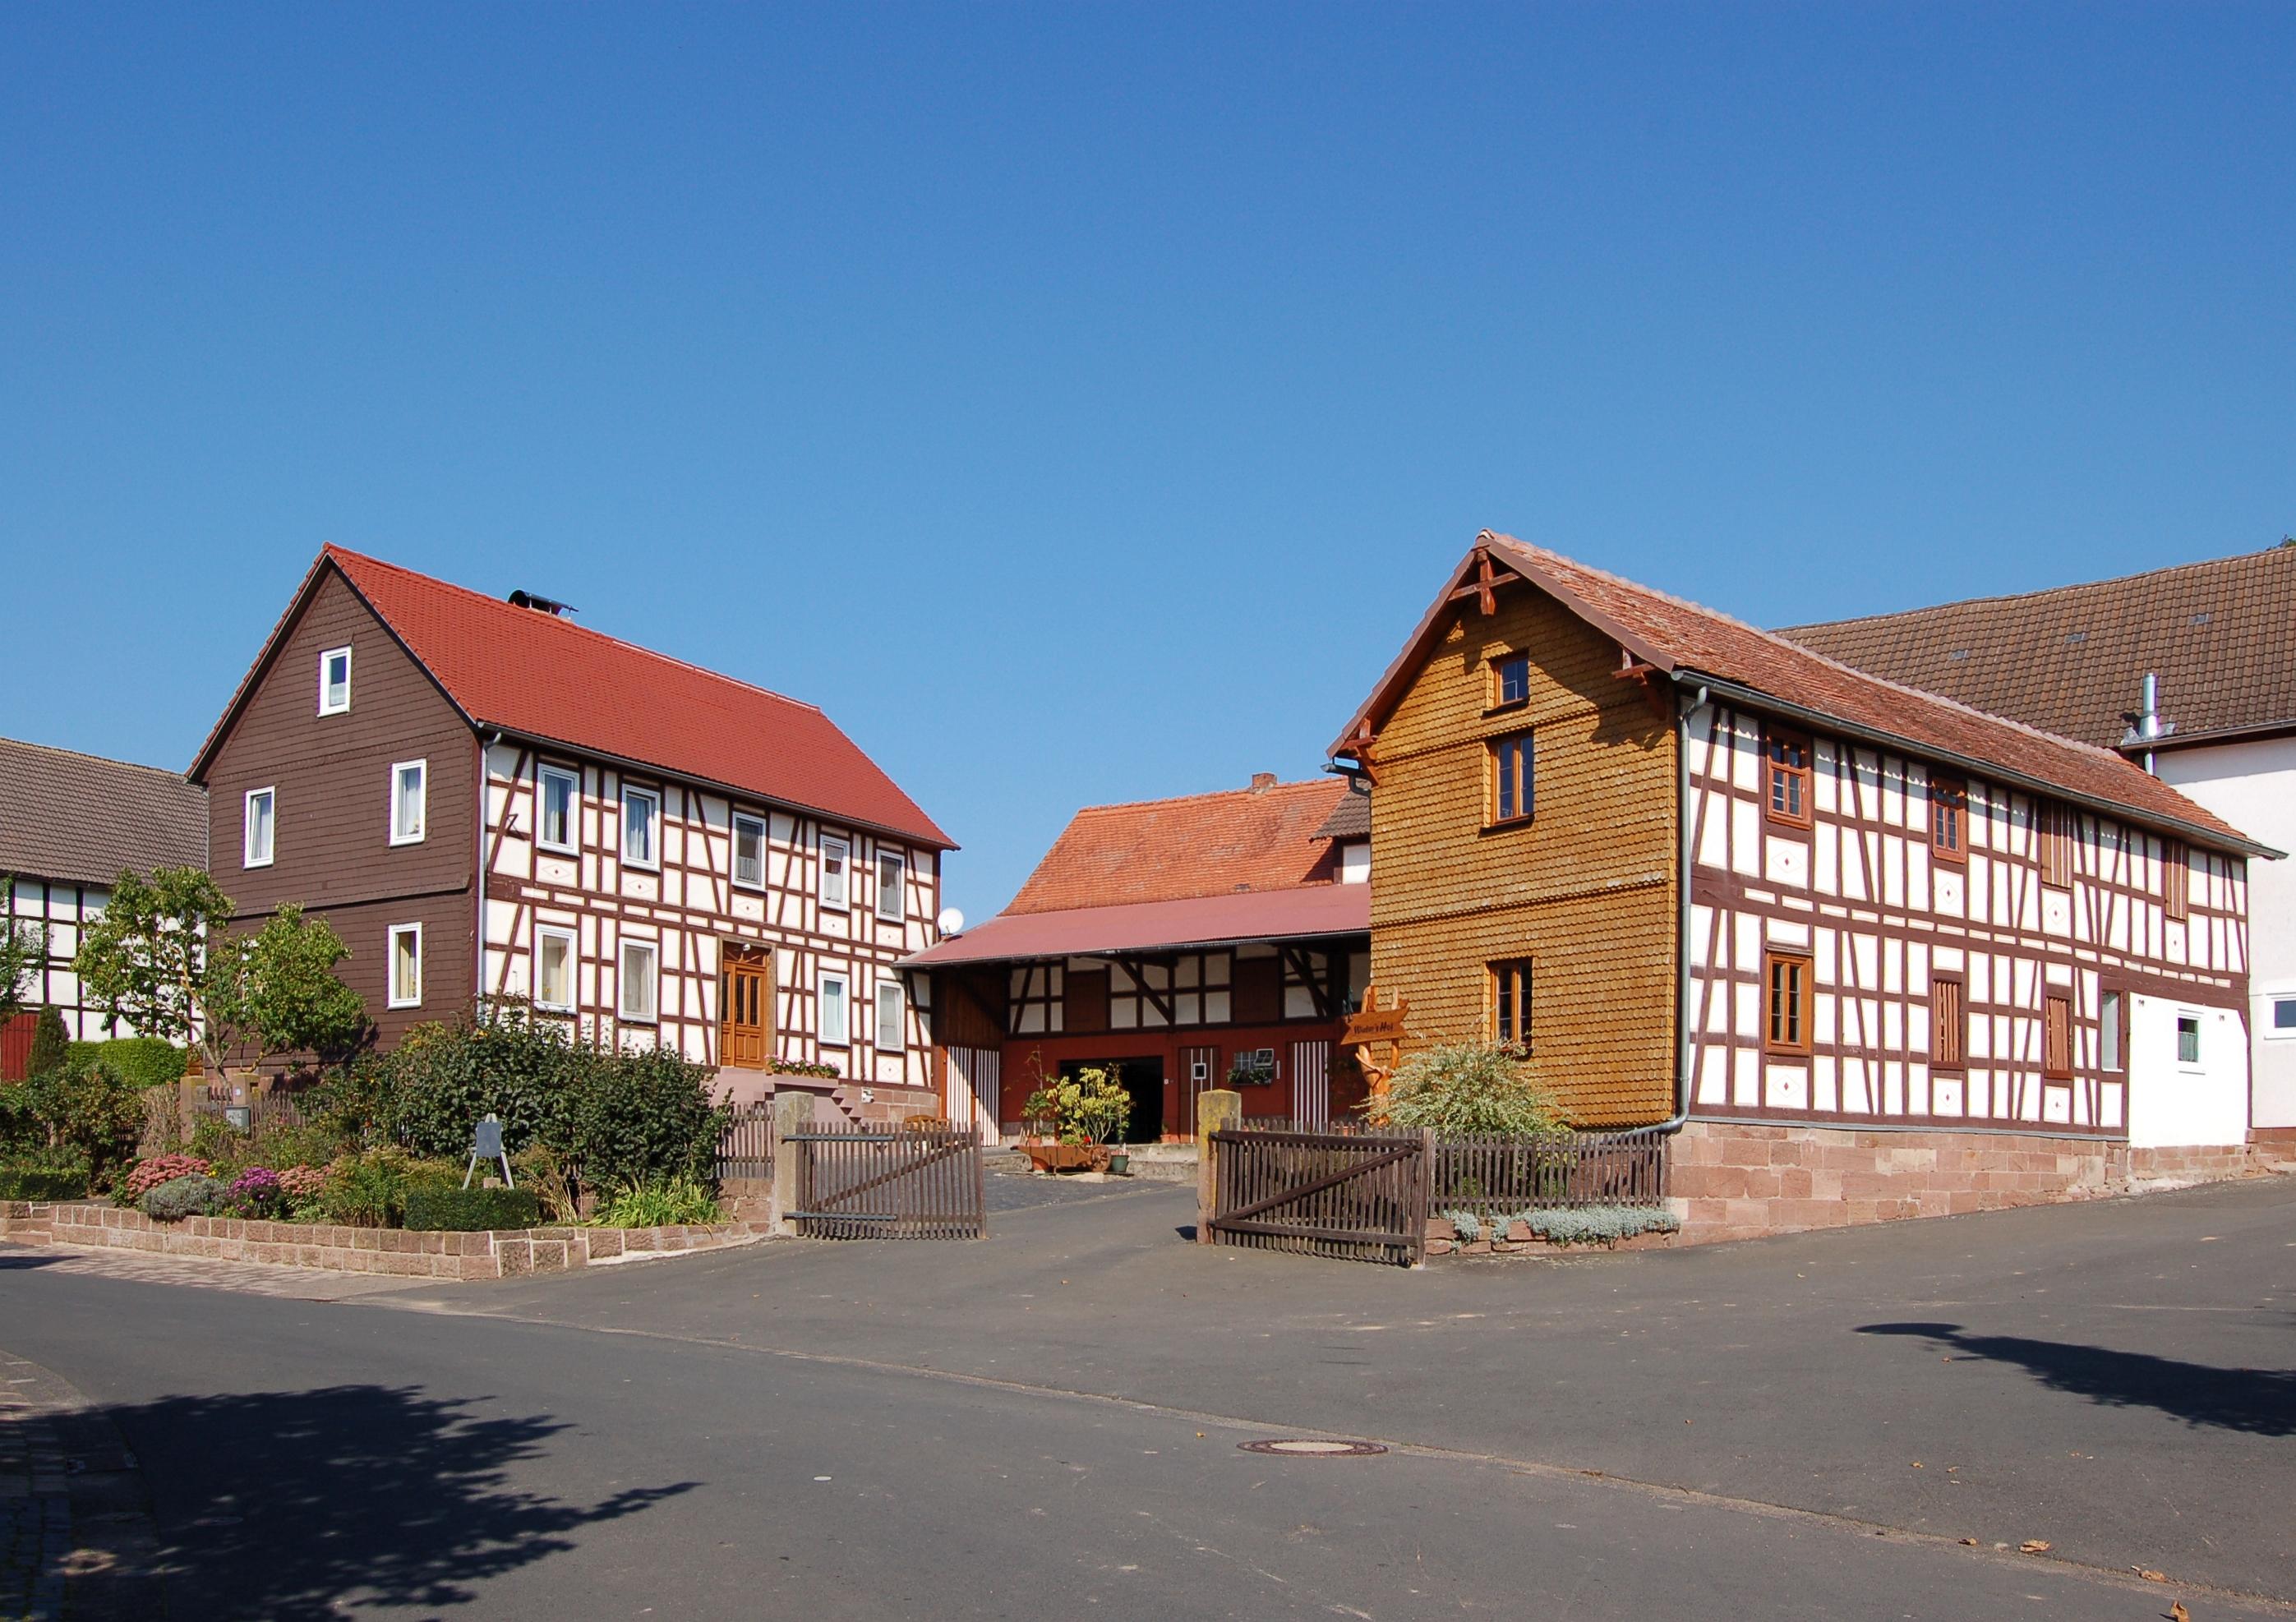 File:An der Linde 19 (Himmelsberg) II.jpg - Wikimedia Commons